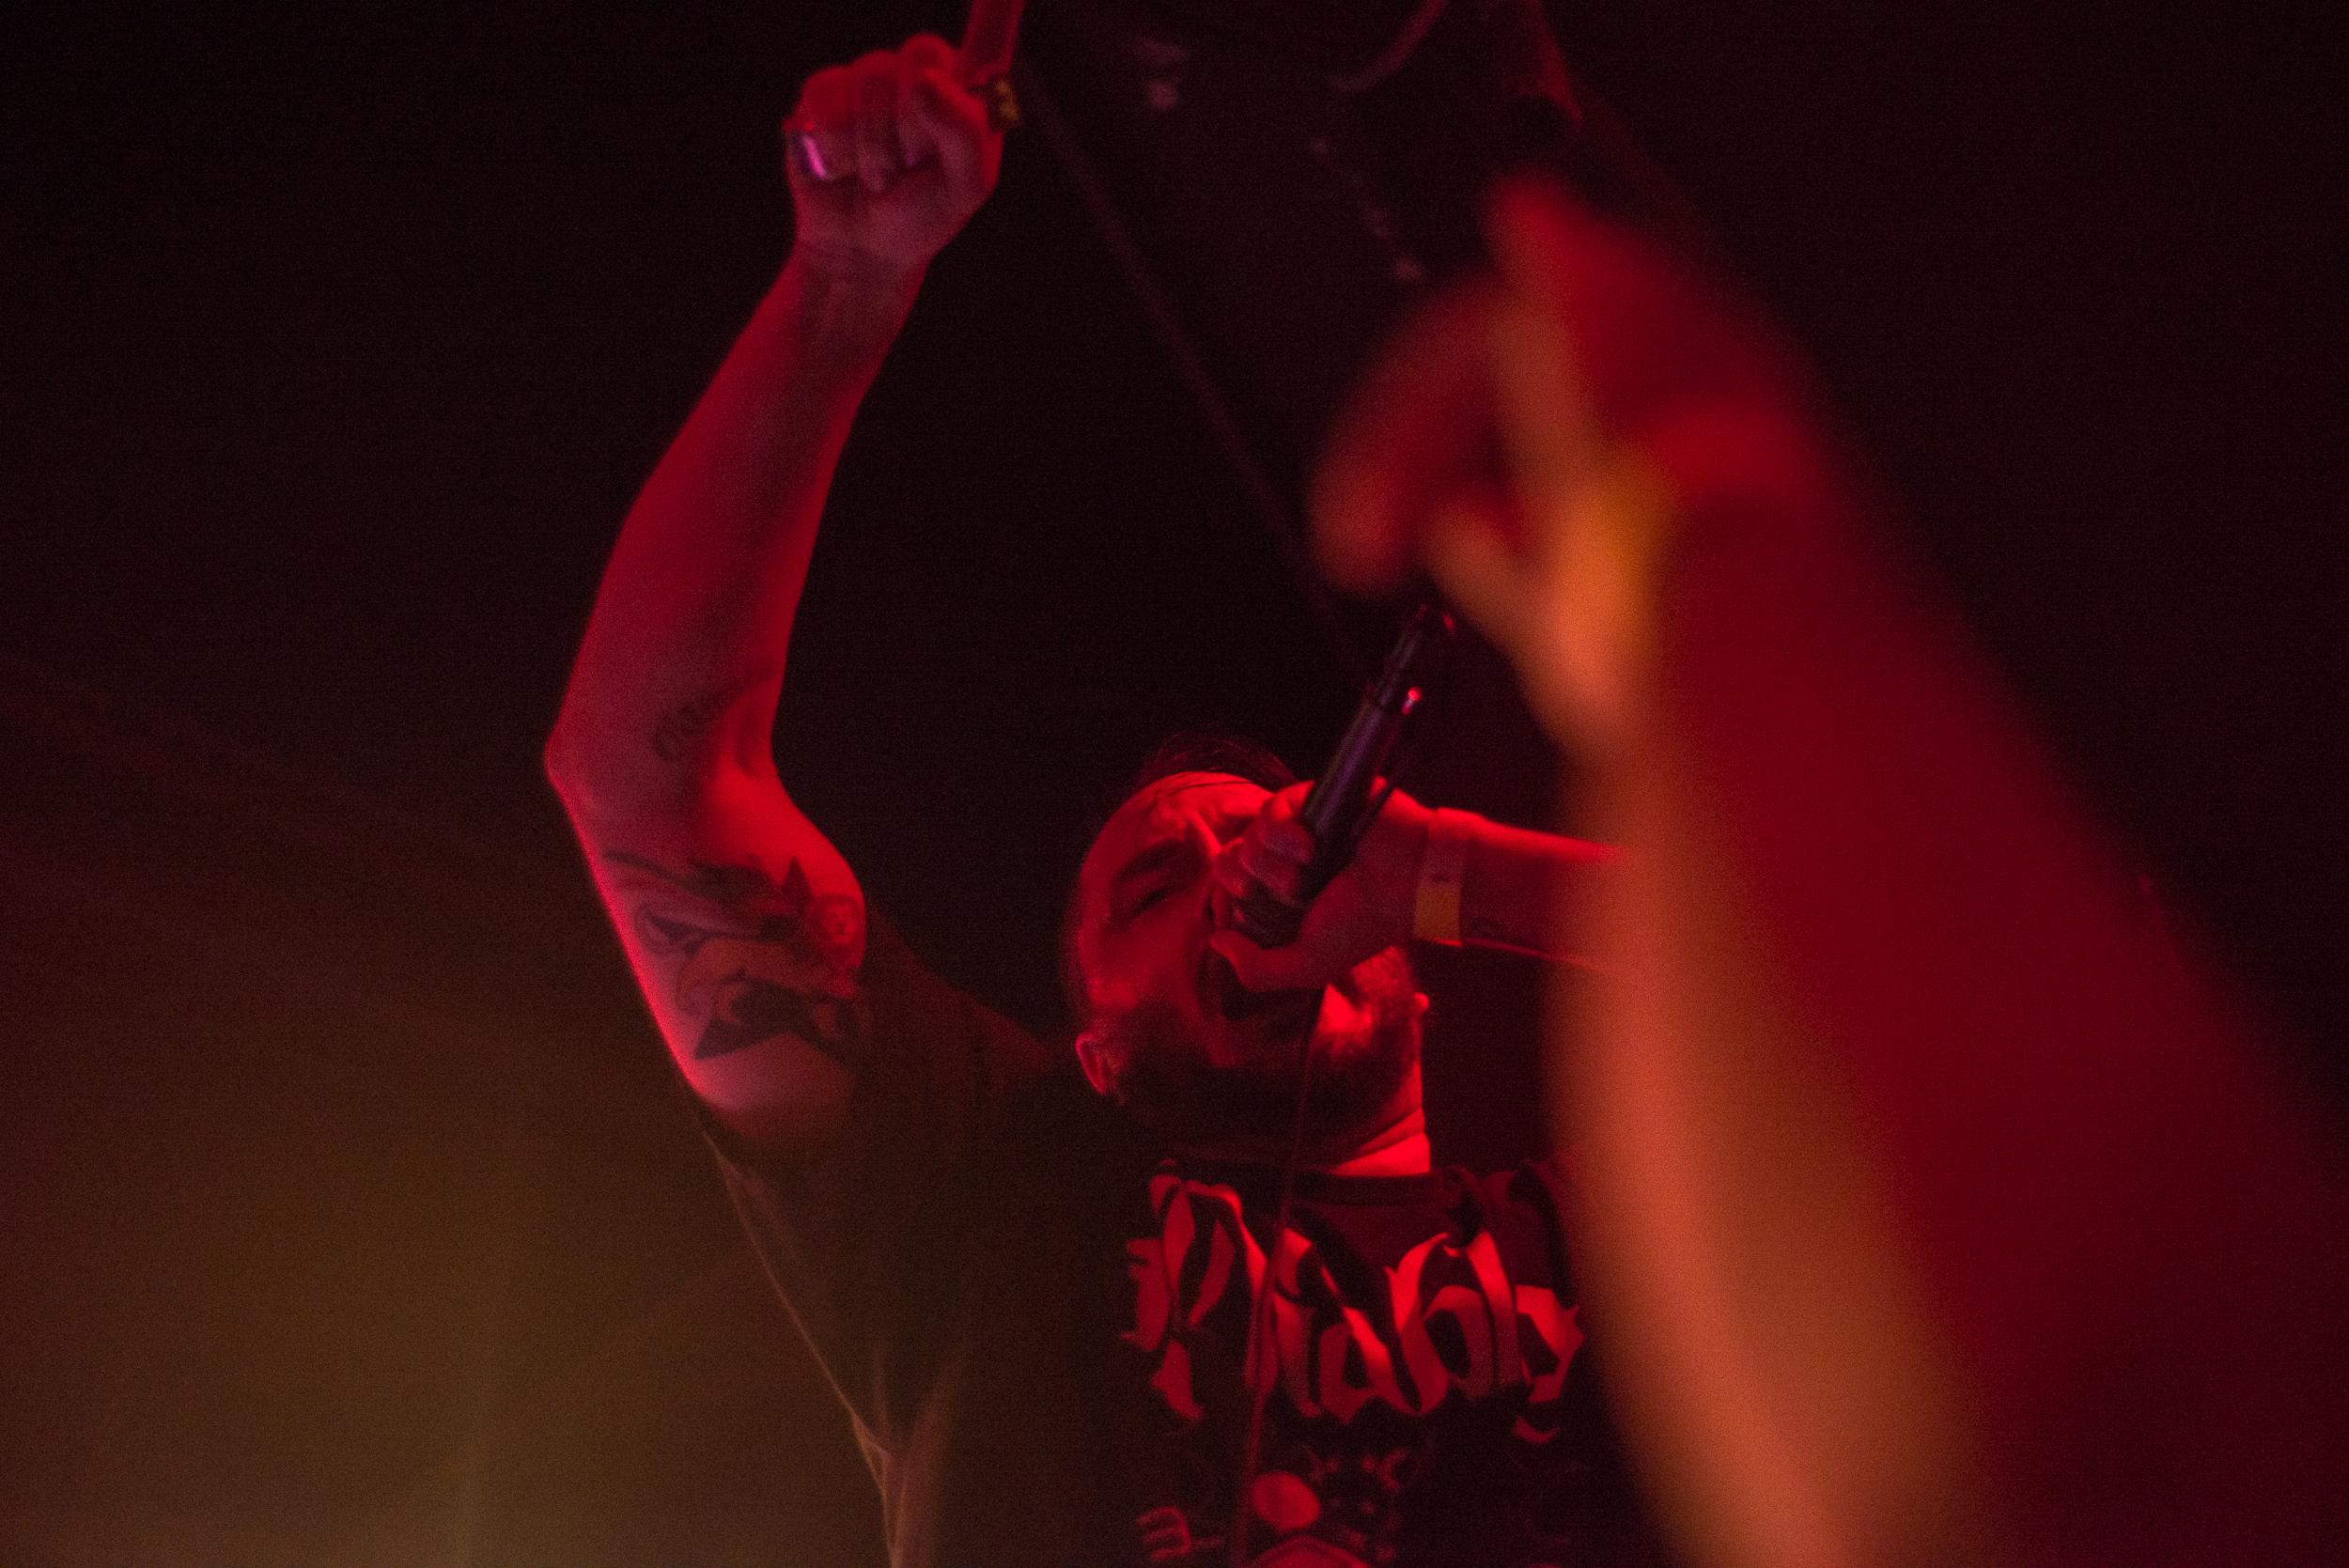 hail-eris-singer-crowd-band-editorial-photography-brooklyn-ny-the-knitting-factory.jpg